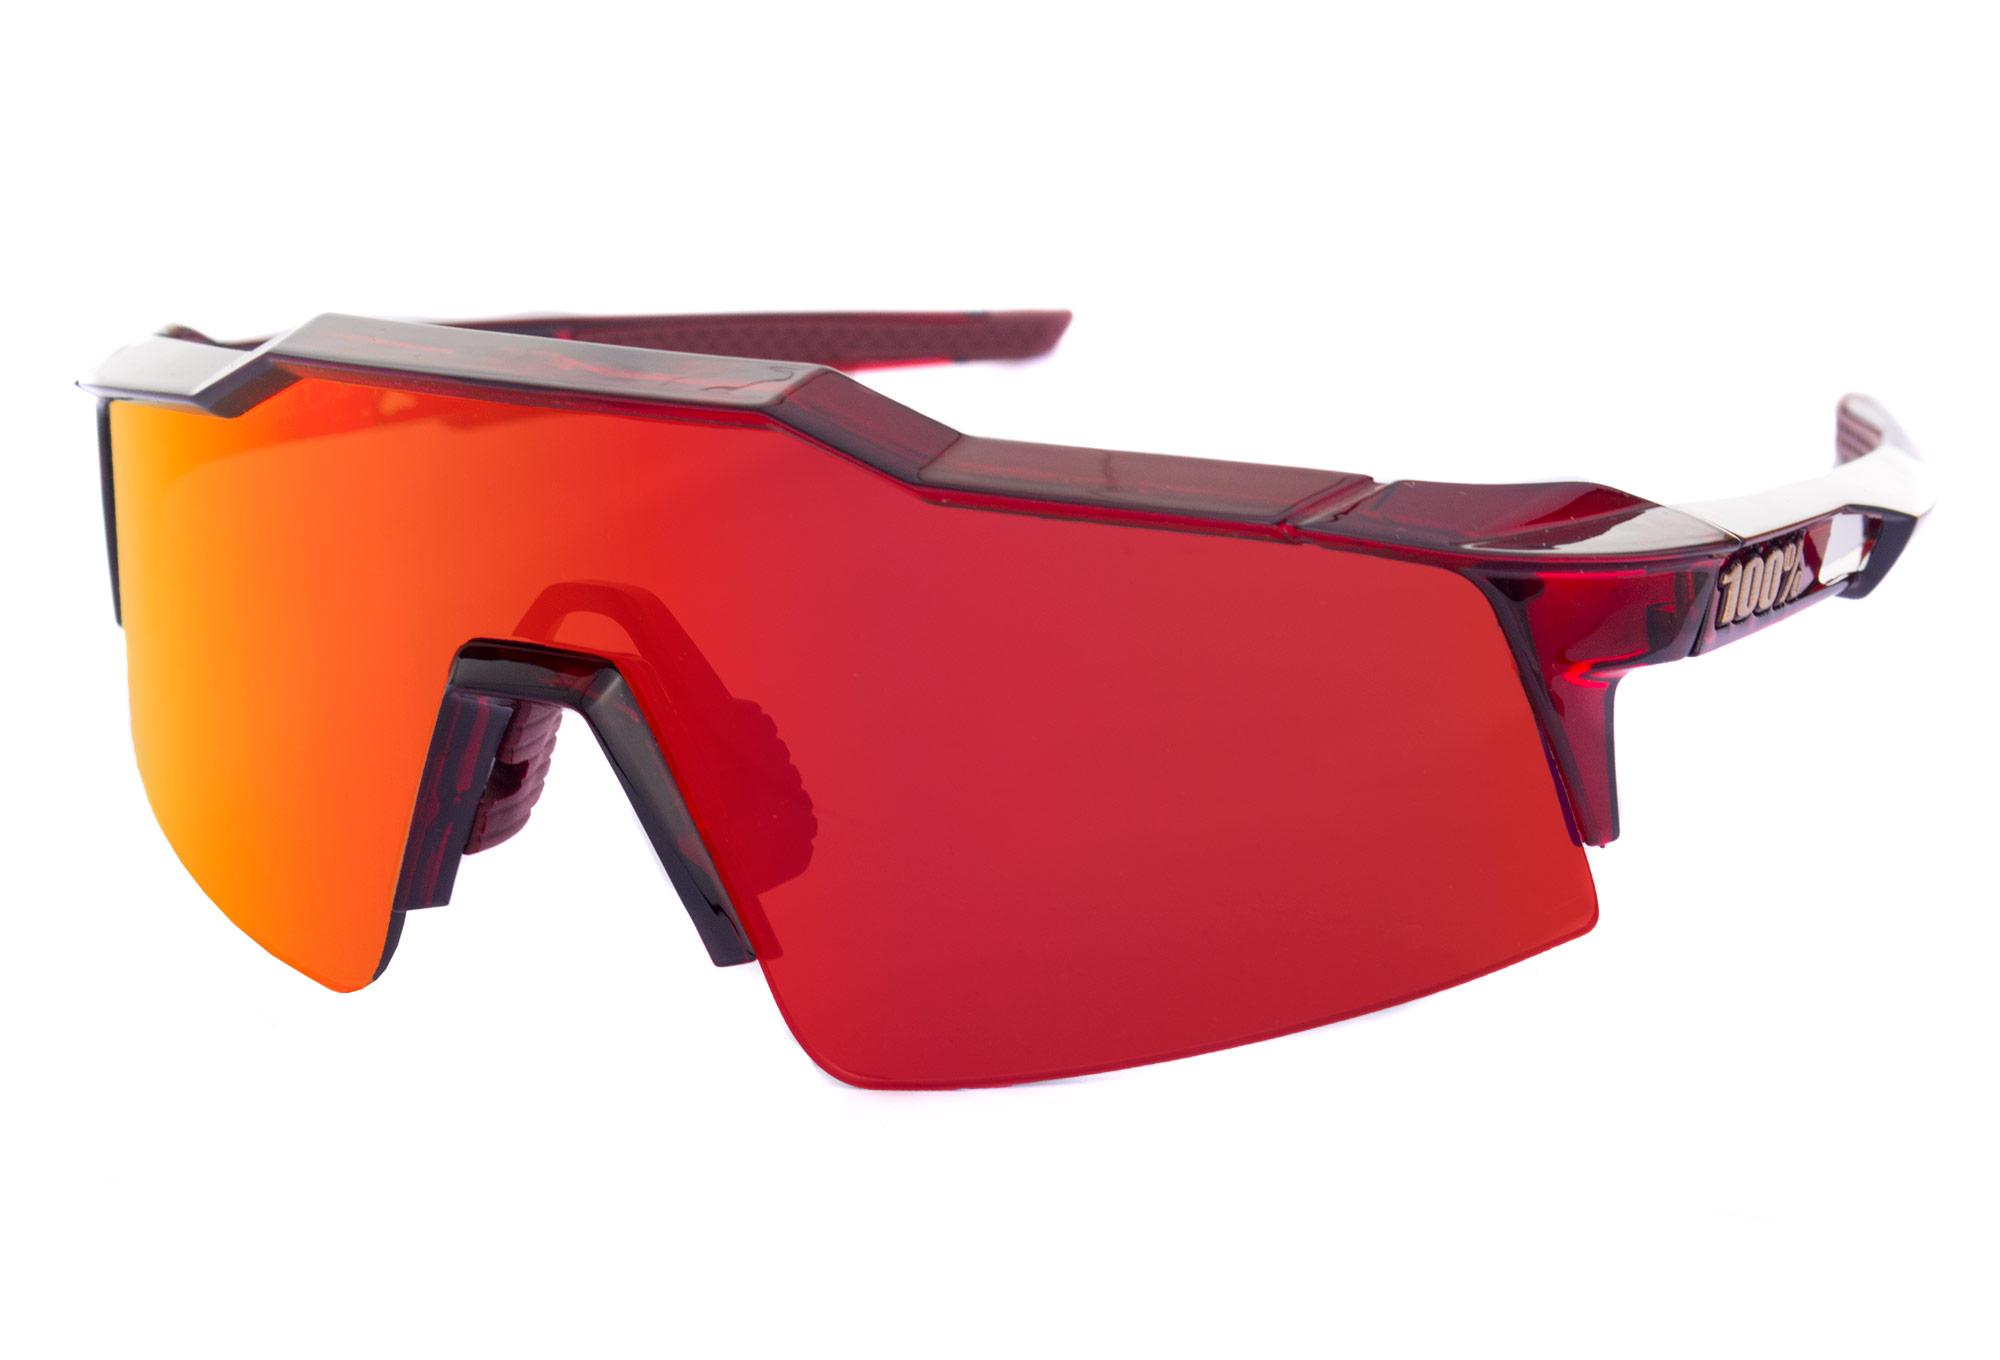 90e4a4c4d7 100% Speedcraft SL Sunglasses Cherry Palace Red - Red Mirror Lens ...